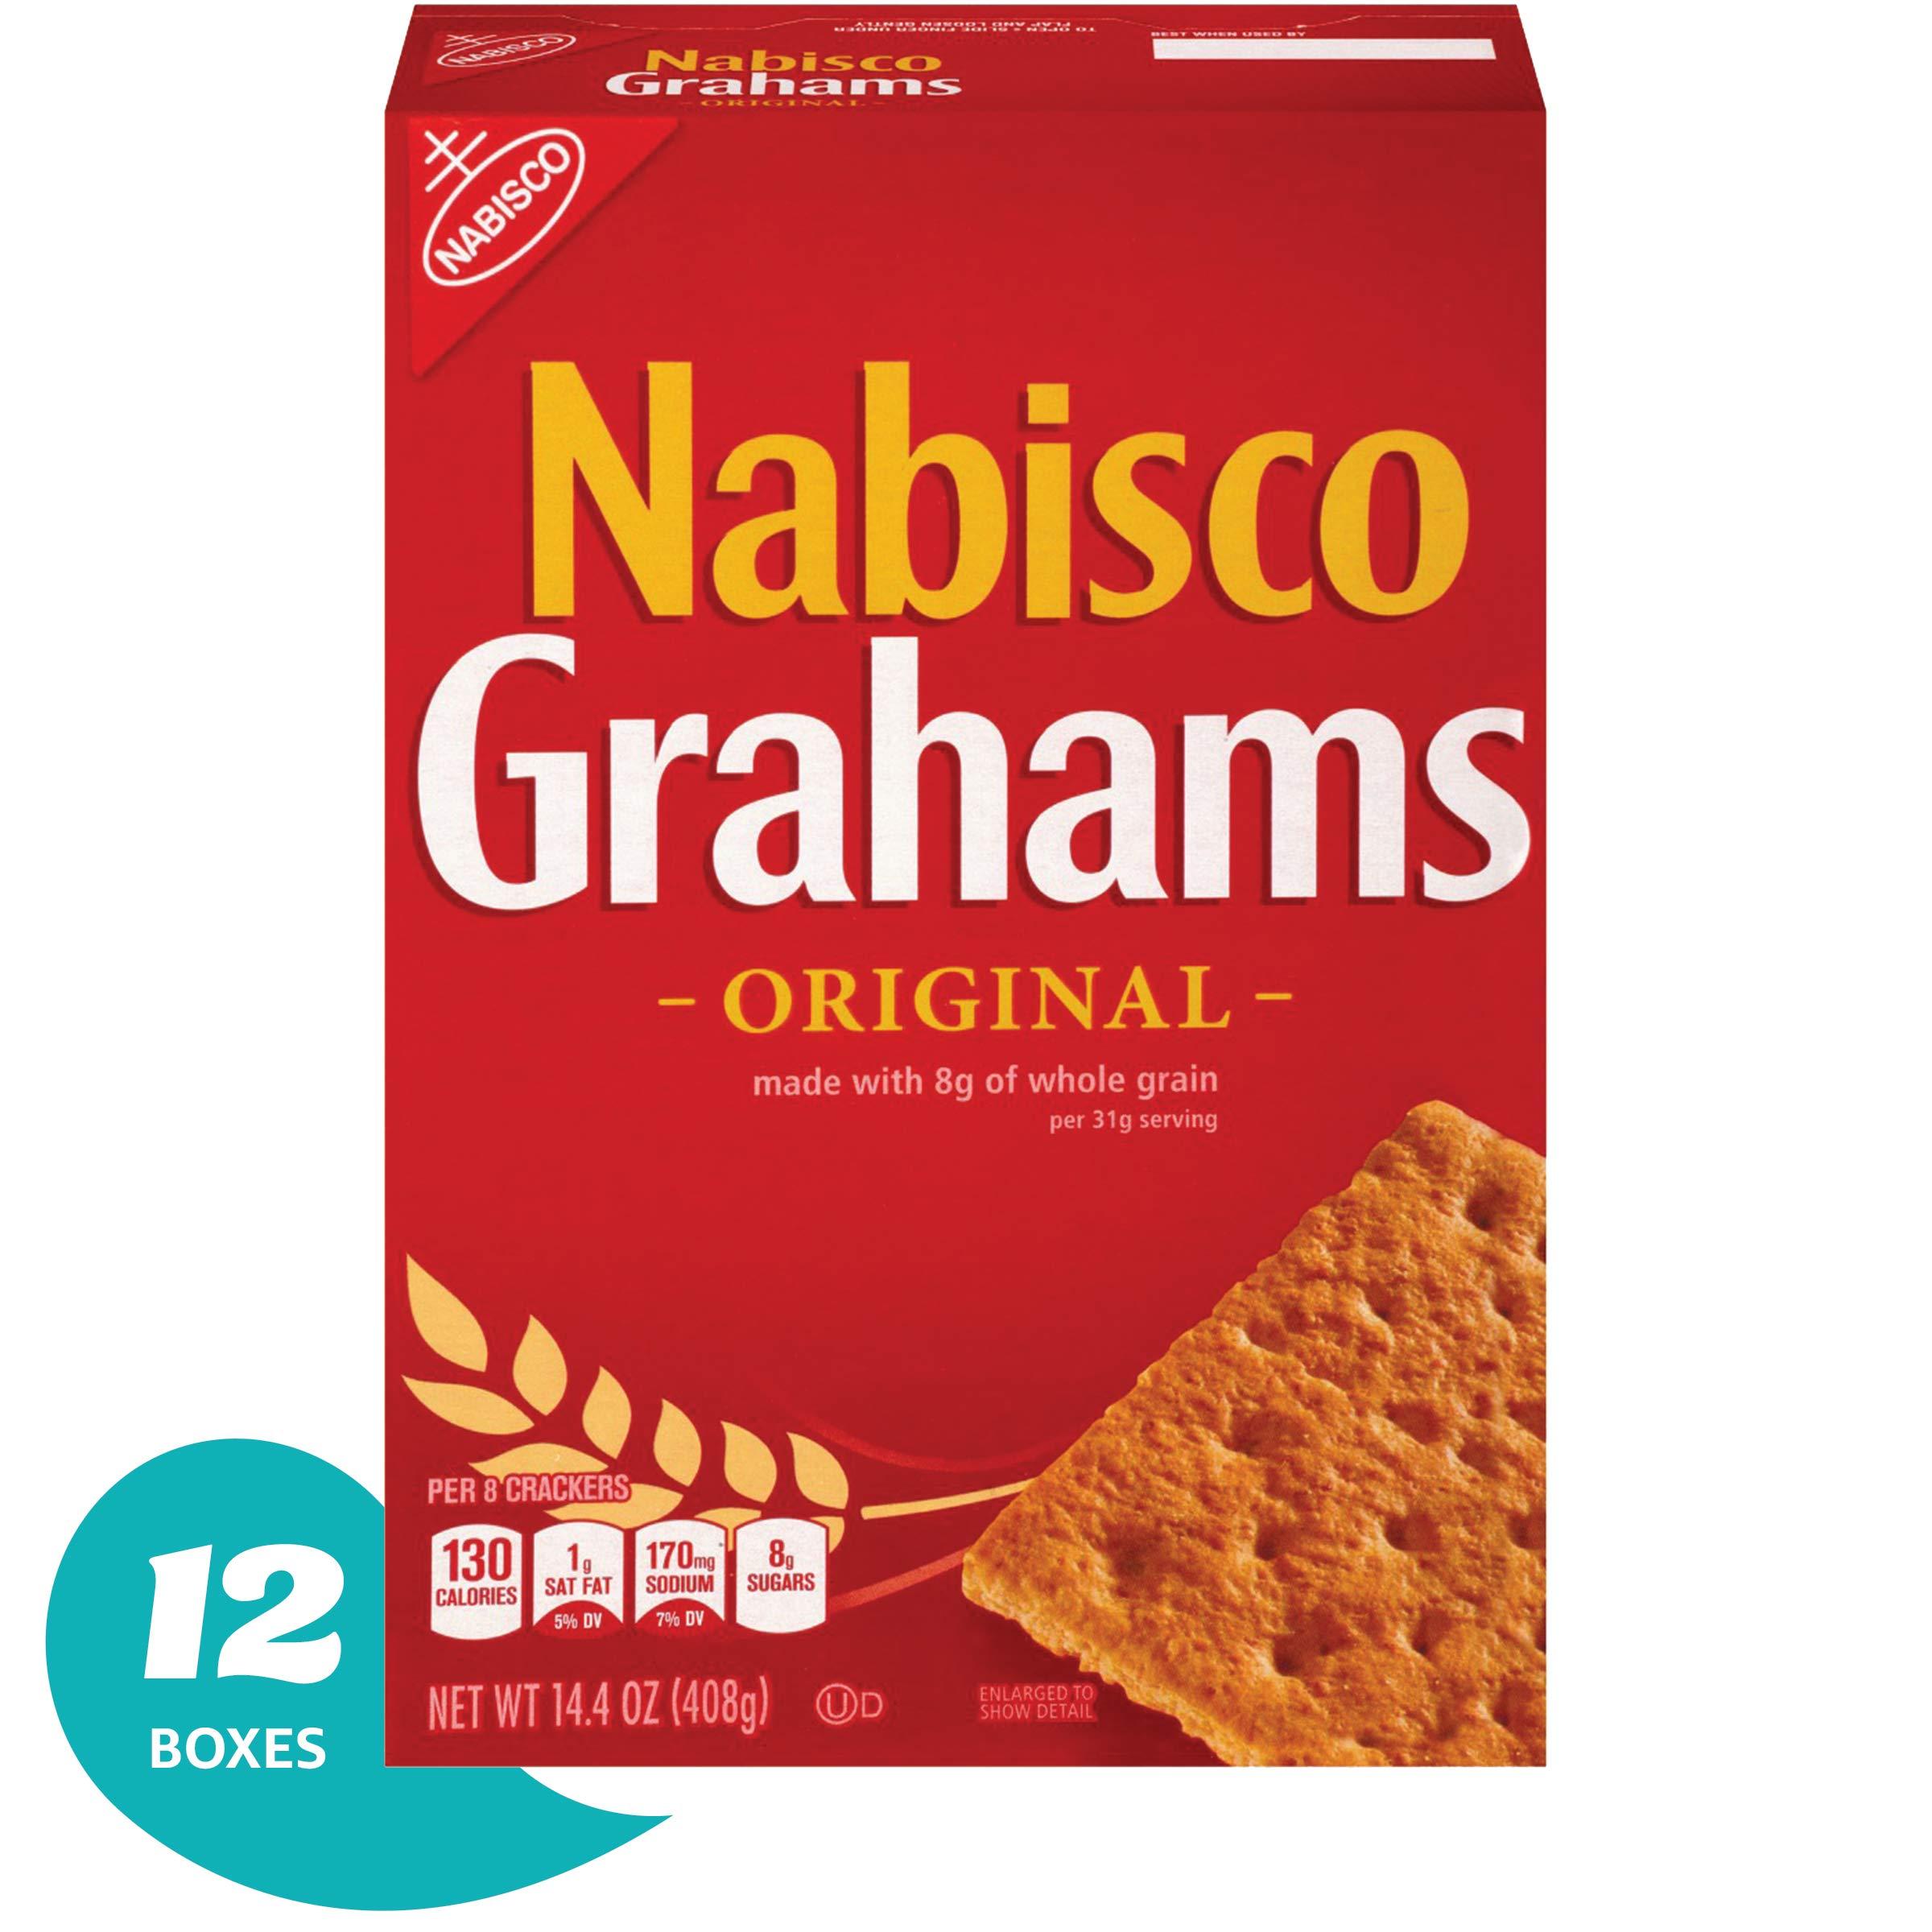 Nabisco Original Grahams Crackers, 14.4 Ounce, (Pack of 12)